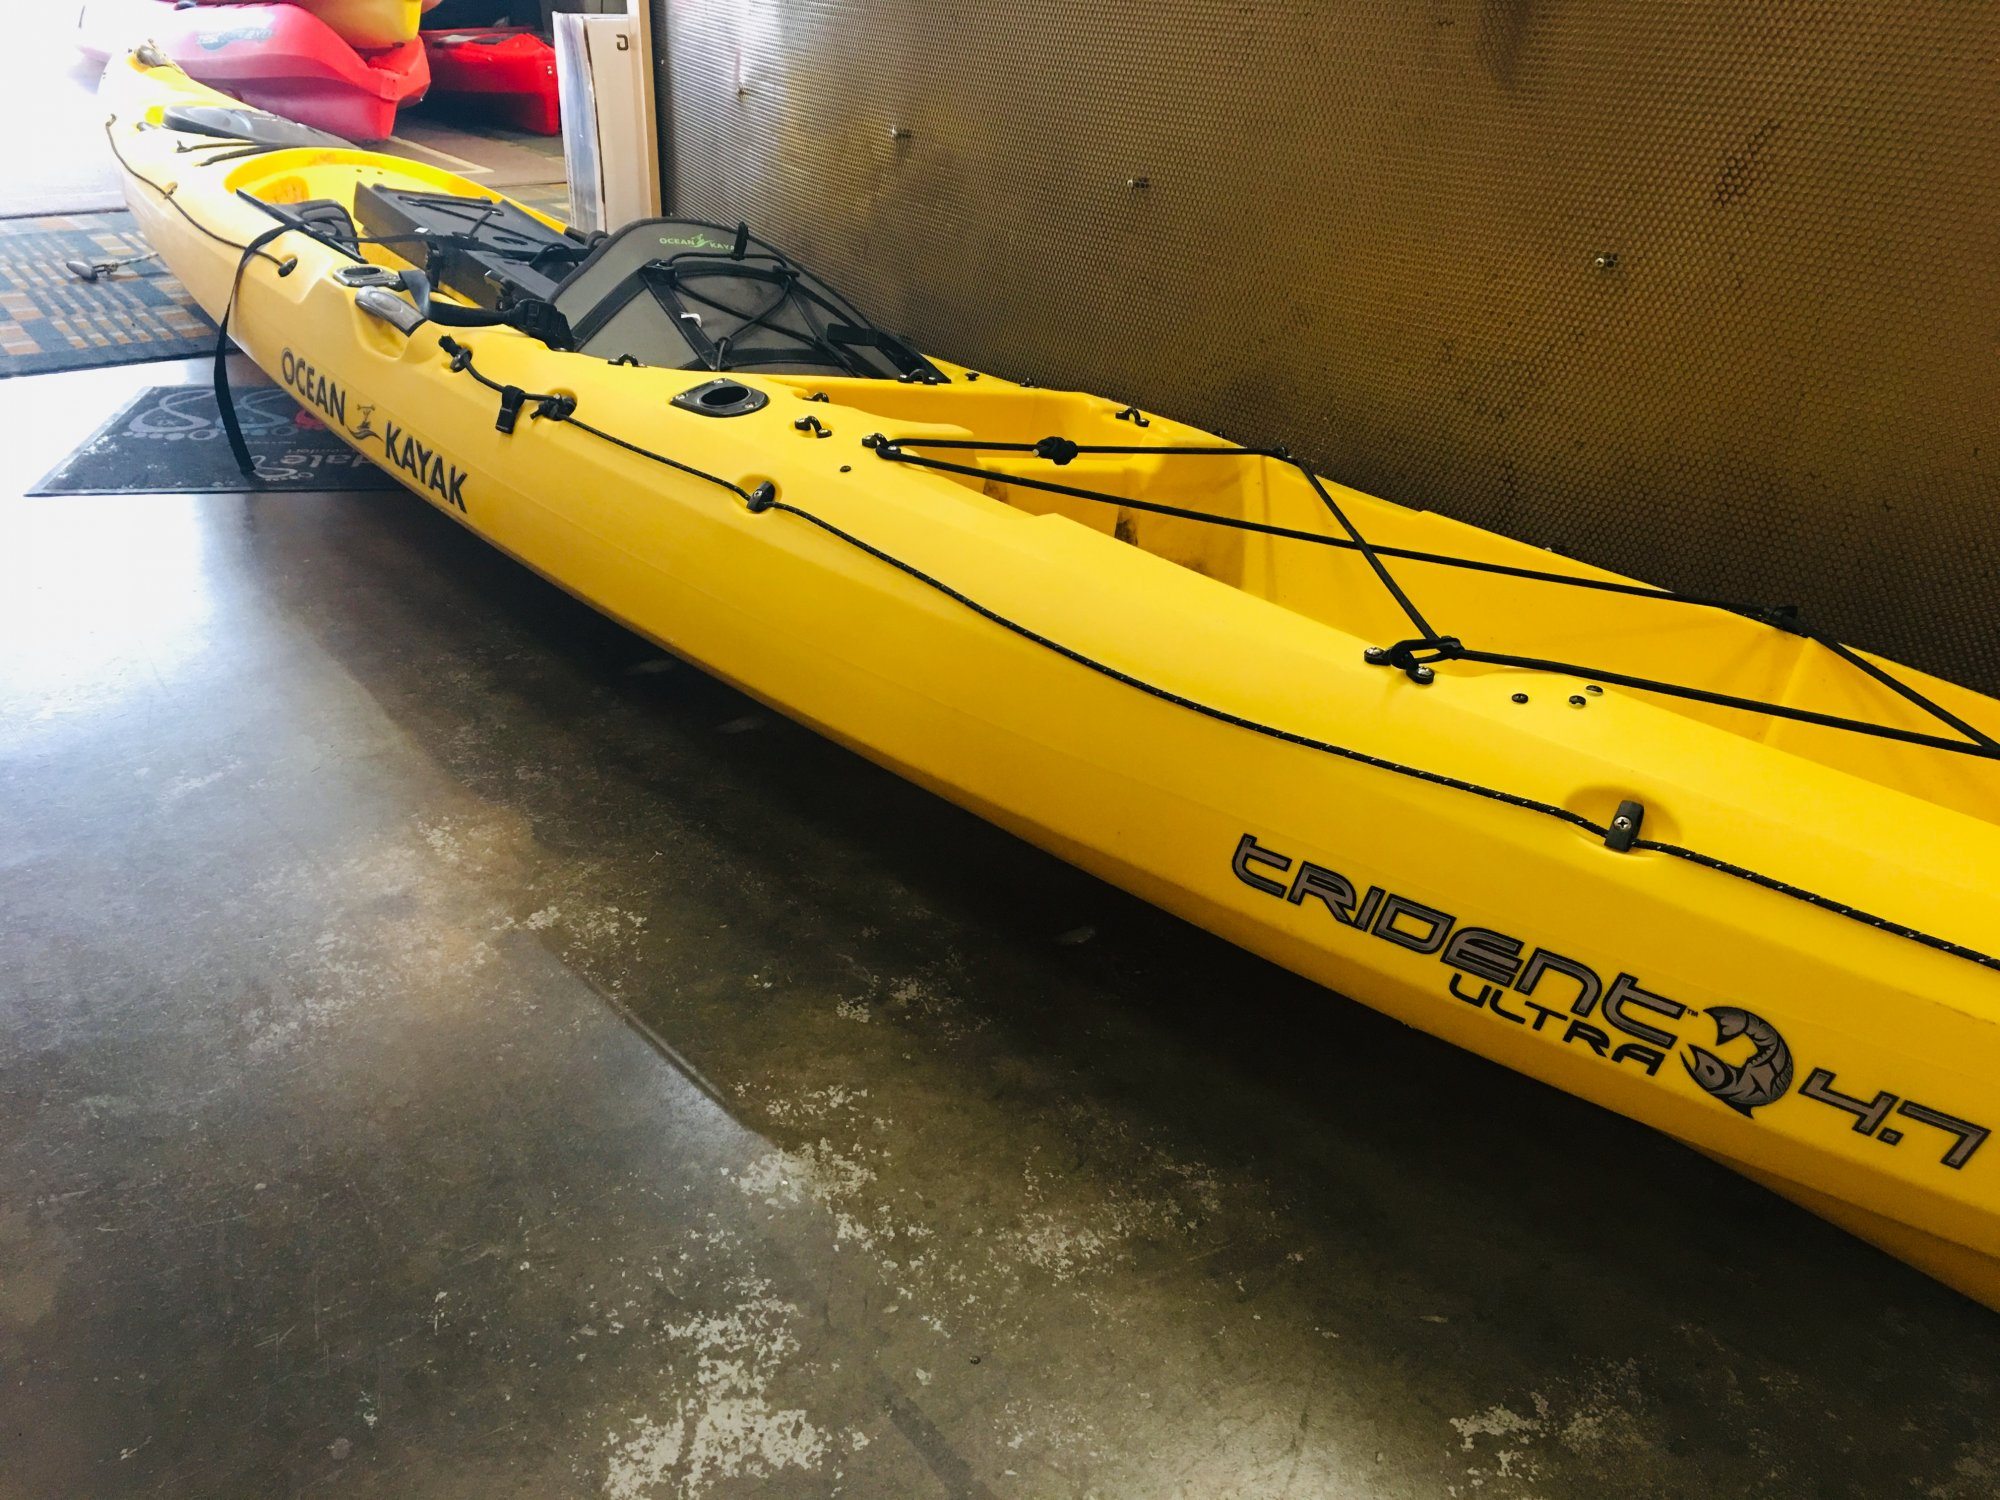 USED-- Ocean Kayak Trident Ultra 4.7